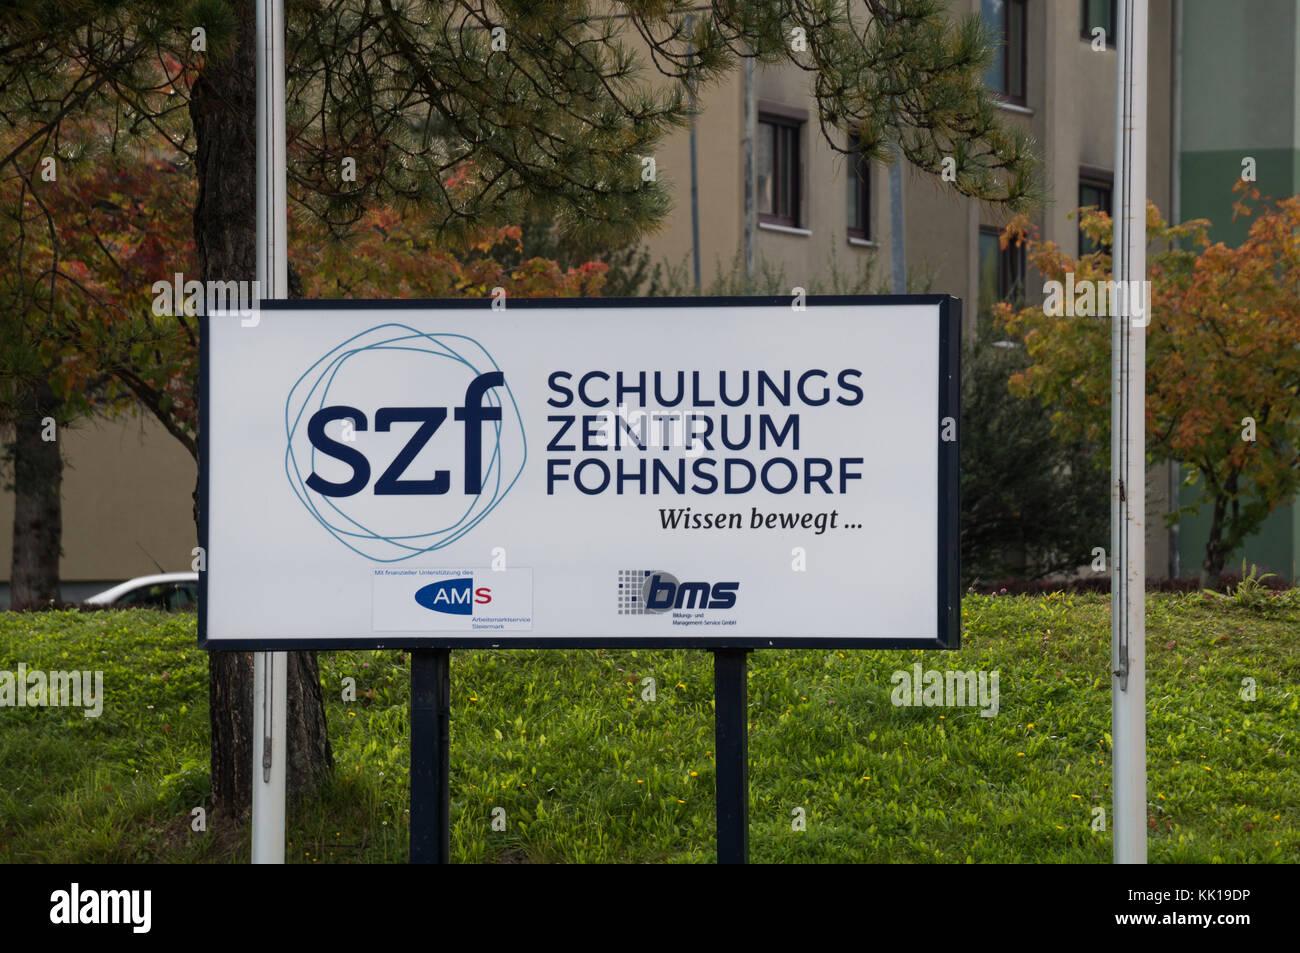 Fohnsdorf, Austria - 29.09.2017: Board outside the Schulungszentrum Fohnsdorf - Stock Image